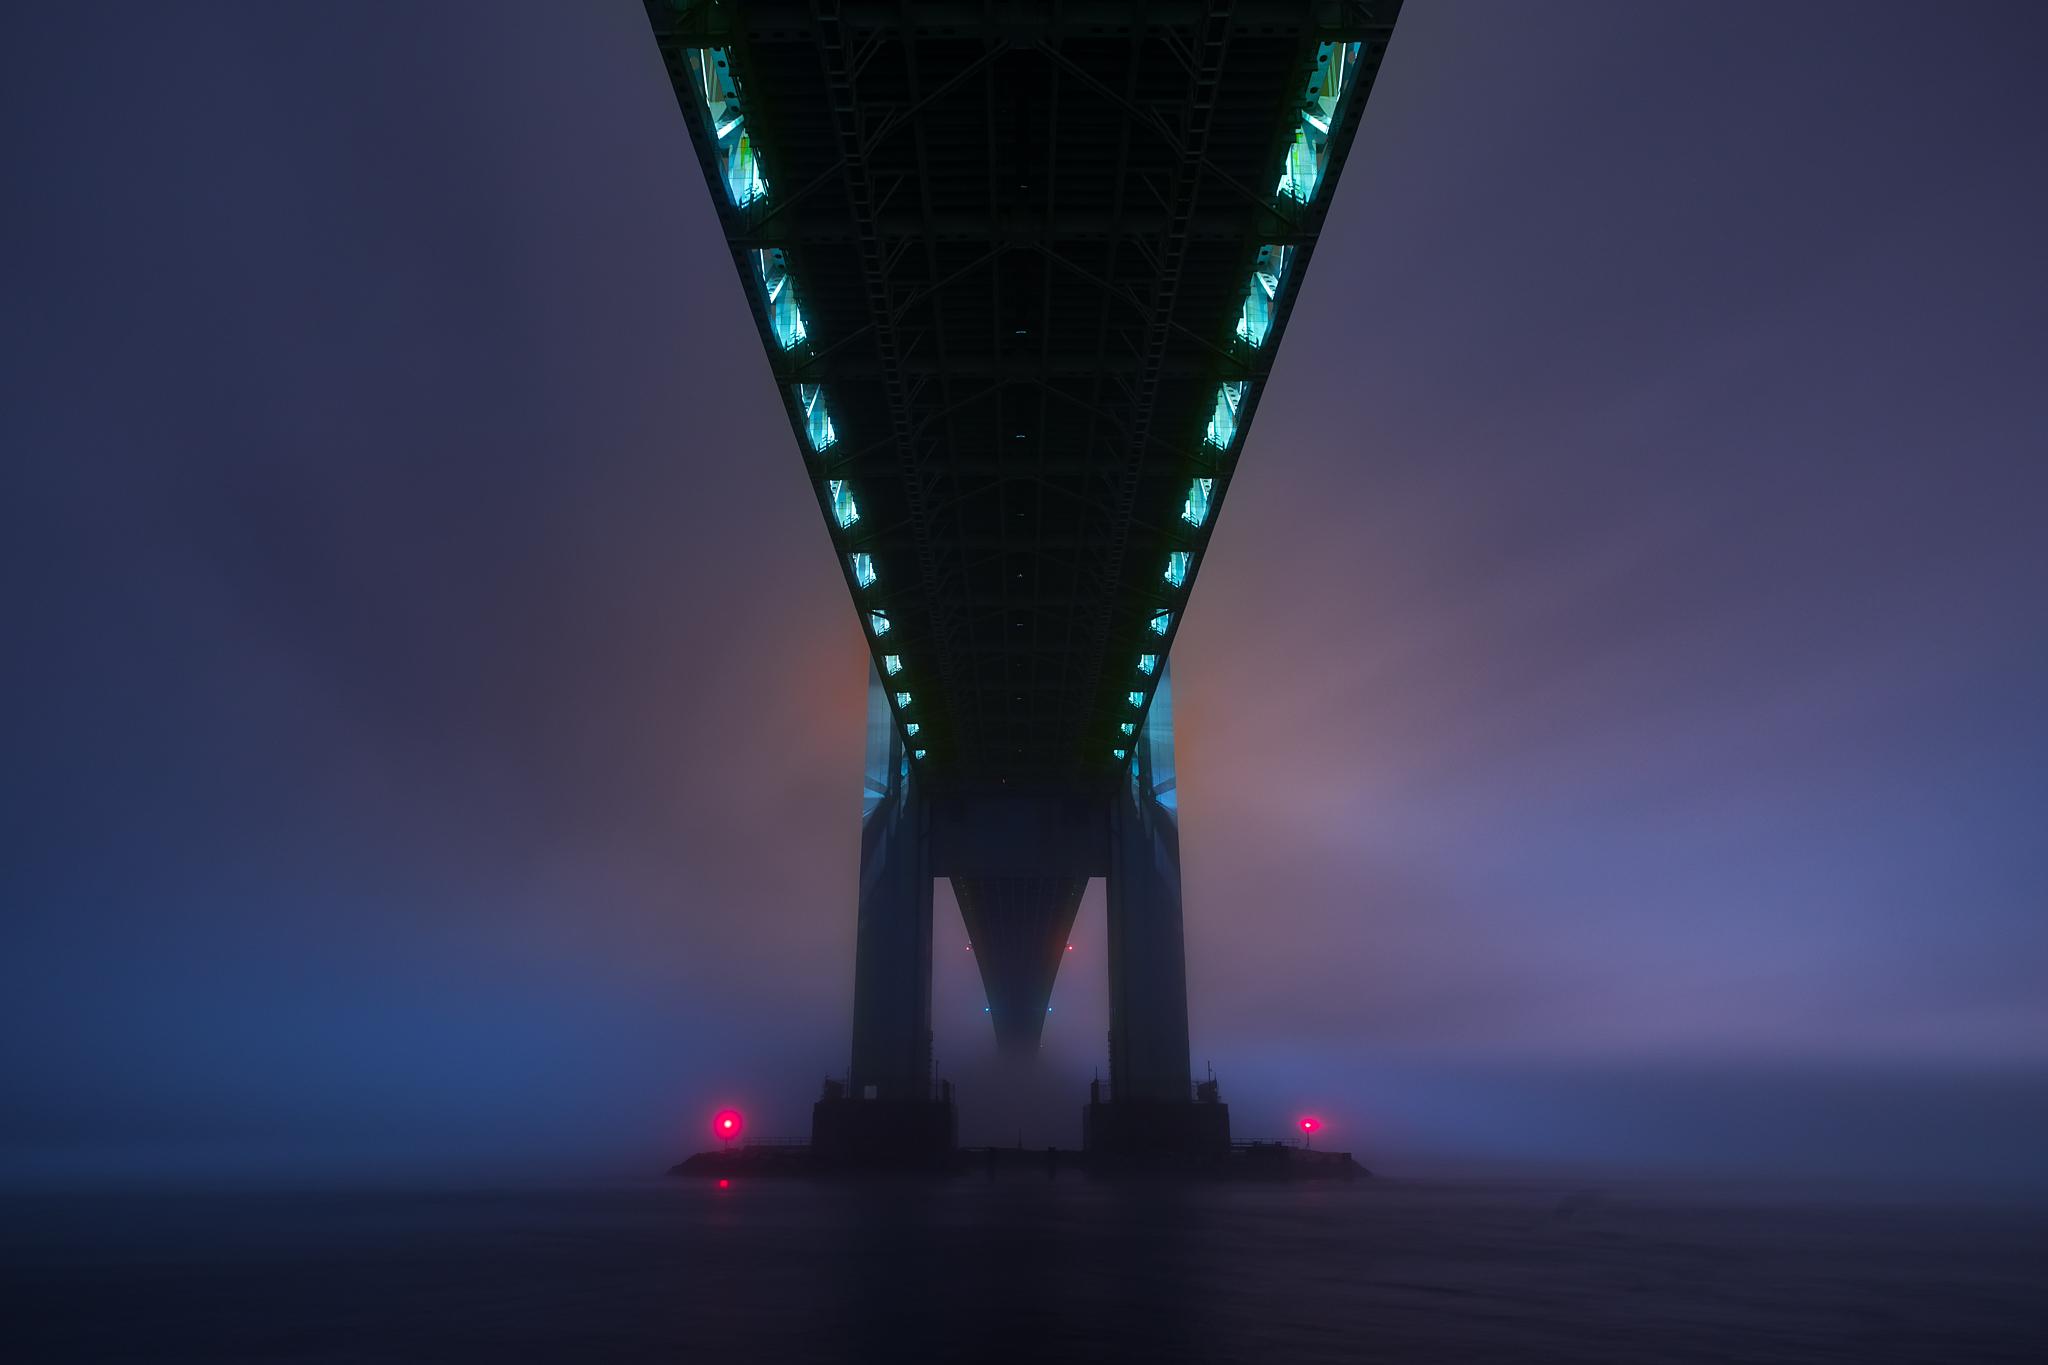 A Foggy Evening Under the Verrazano-Narrows Bridge - Bay Ridge, 2018